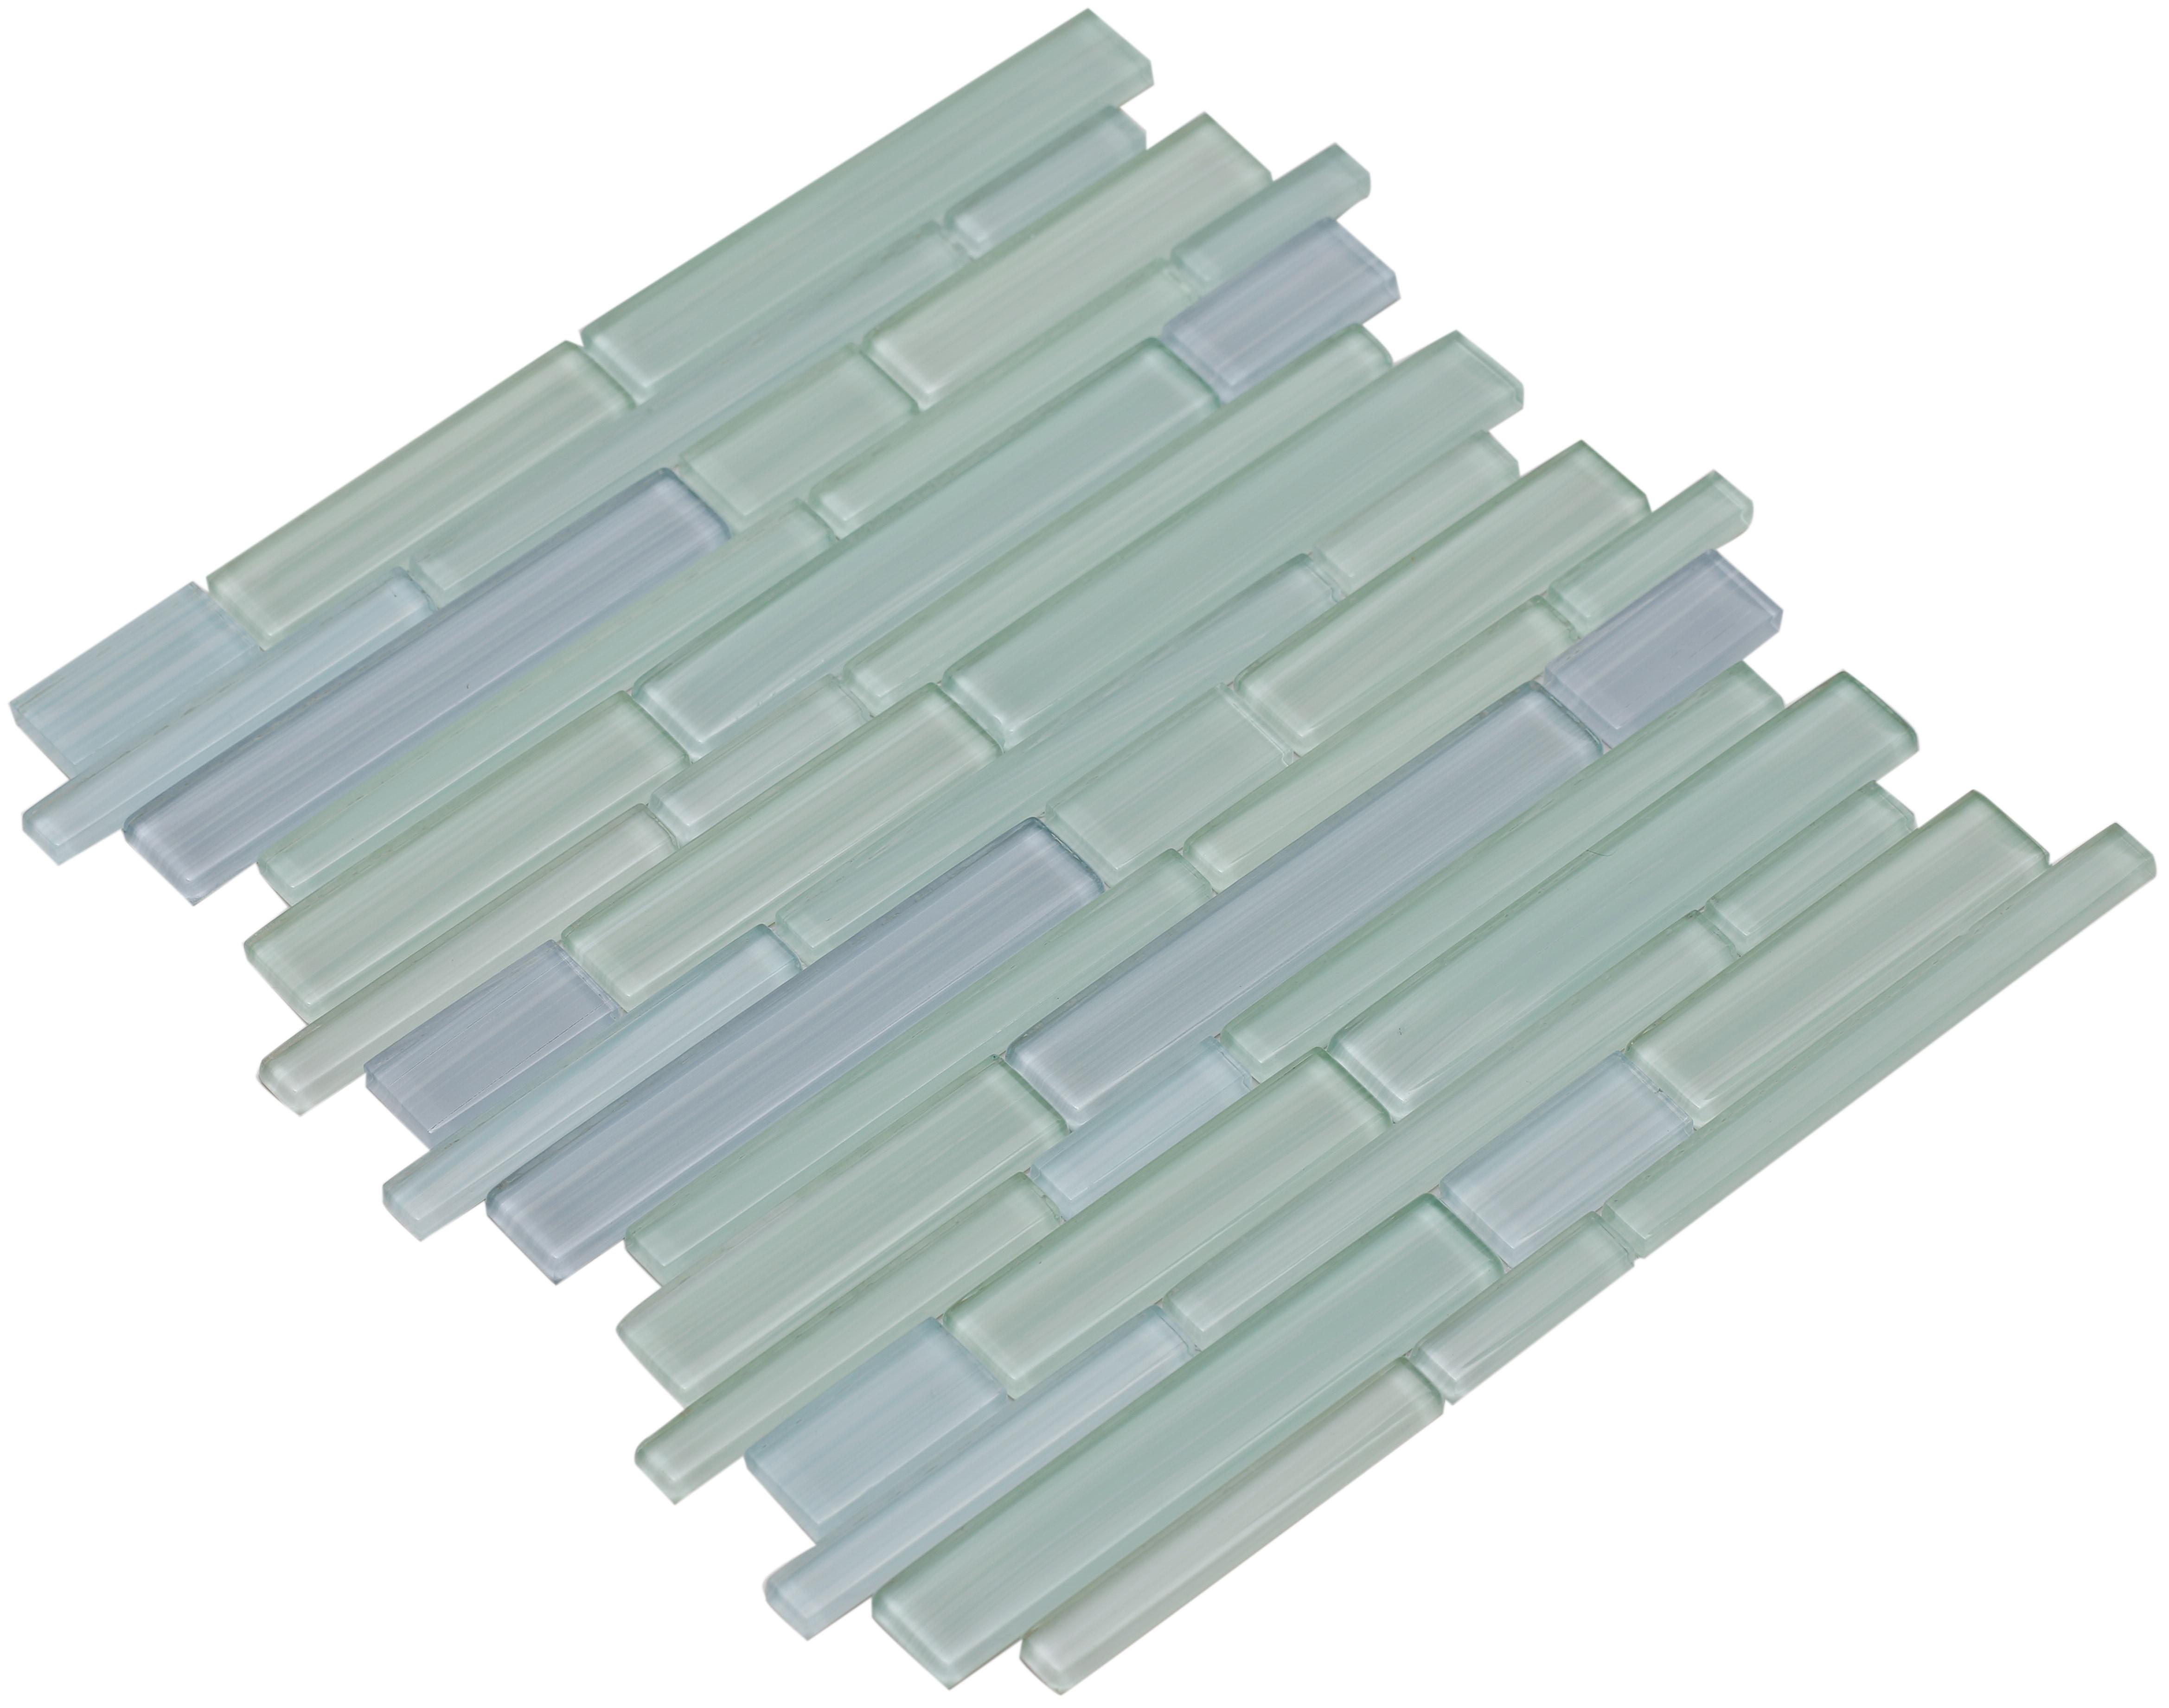 Varying sky blue and sea foam green shiny hand painted glass / Interlocking Mahi Series 0